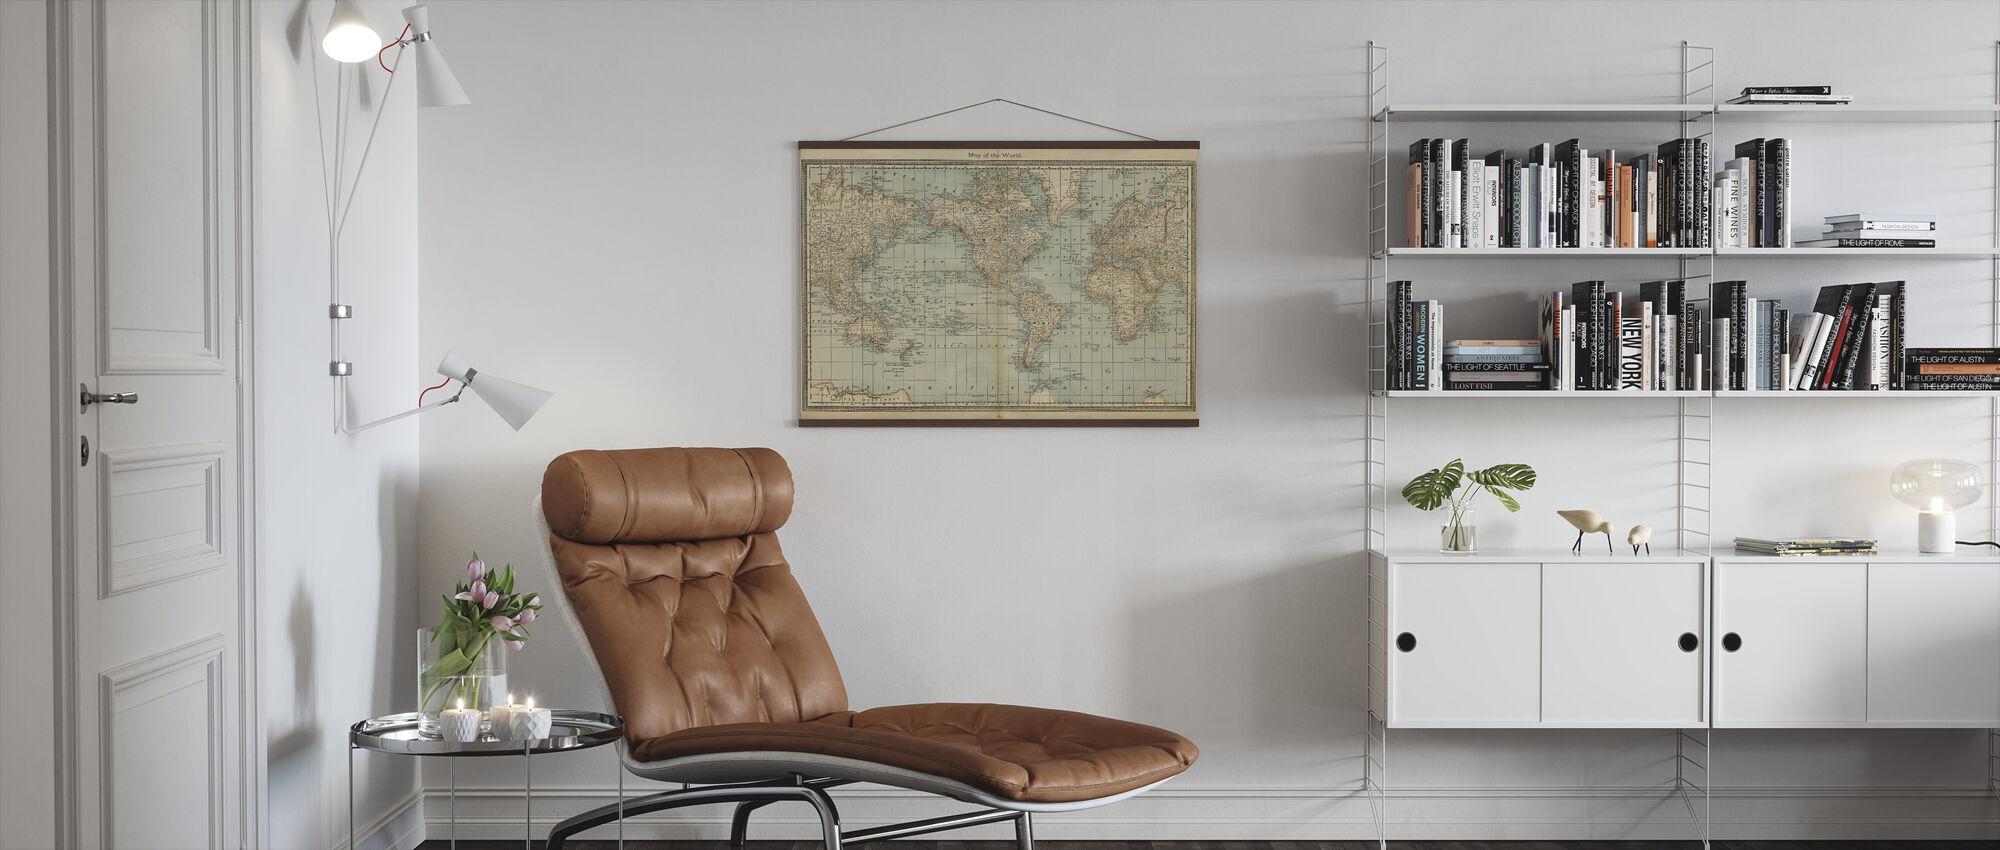 Pale Vintage World Kartta - Juliste - Olohuone